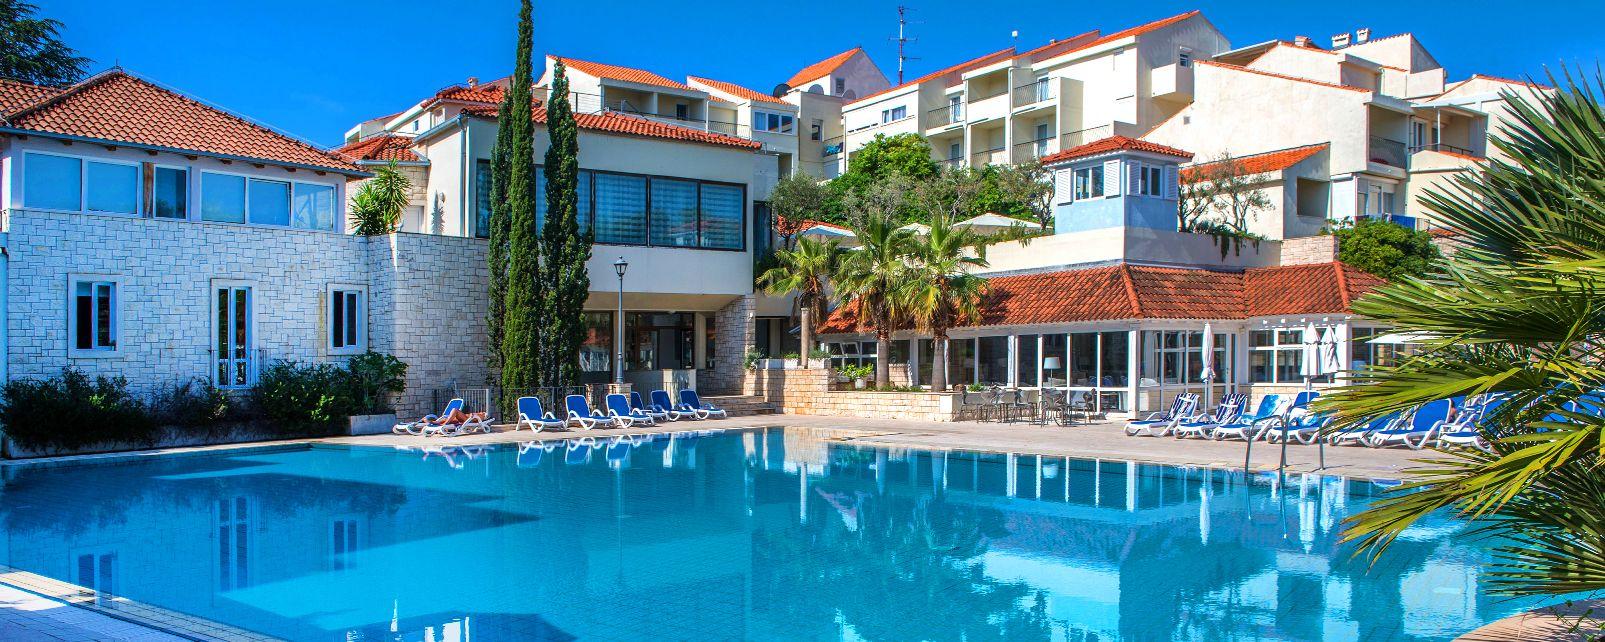 Ile De Brac Croatie Hotel Kaktus